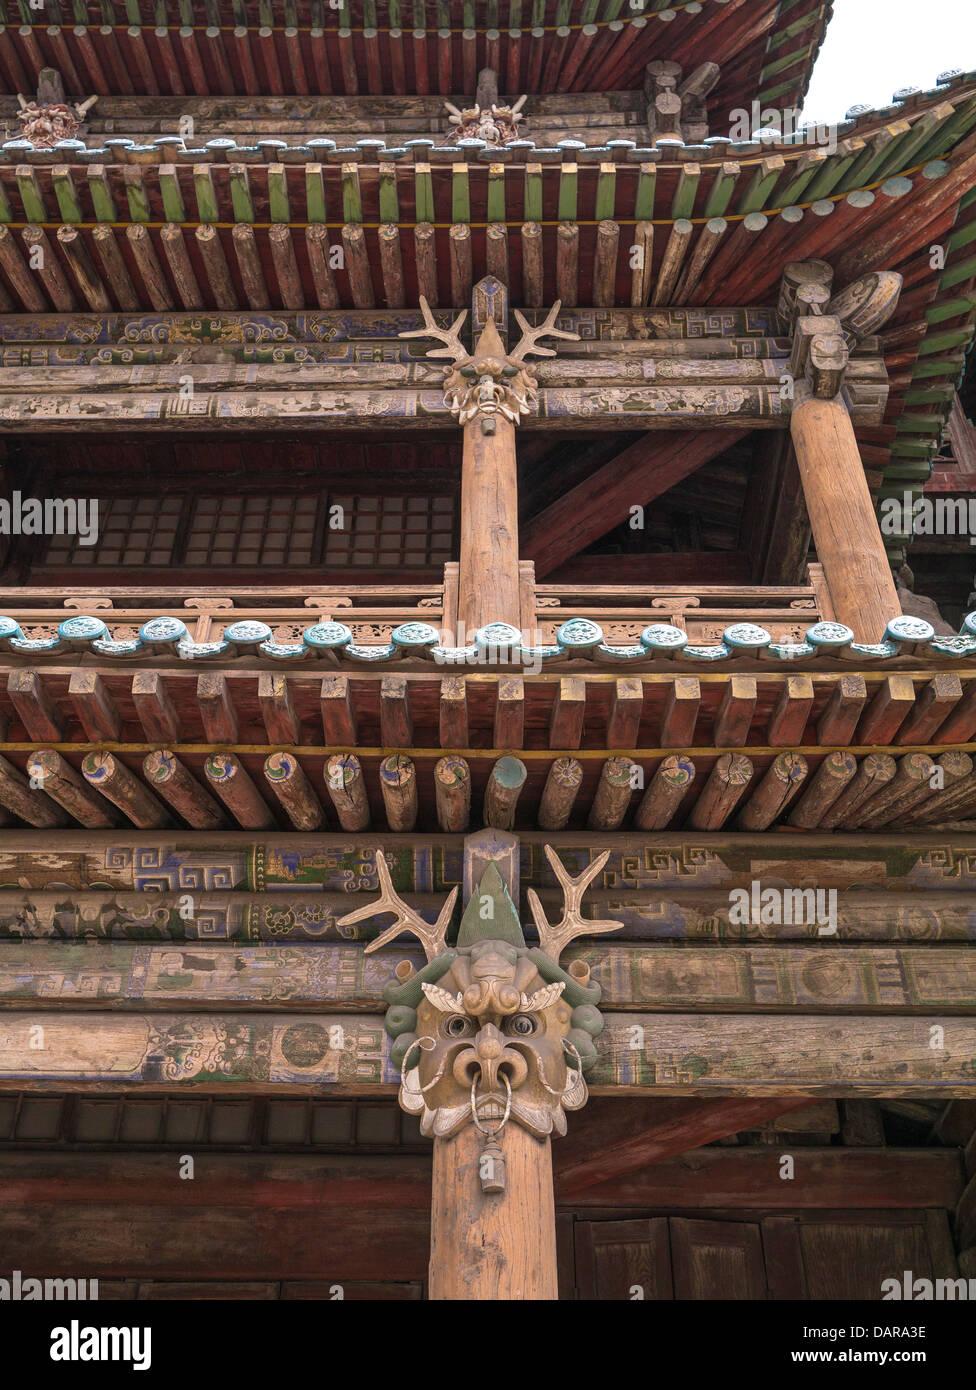 Wooden Building Decoration. Yungang Grottoes. Shanxi. China - Stock Image